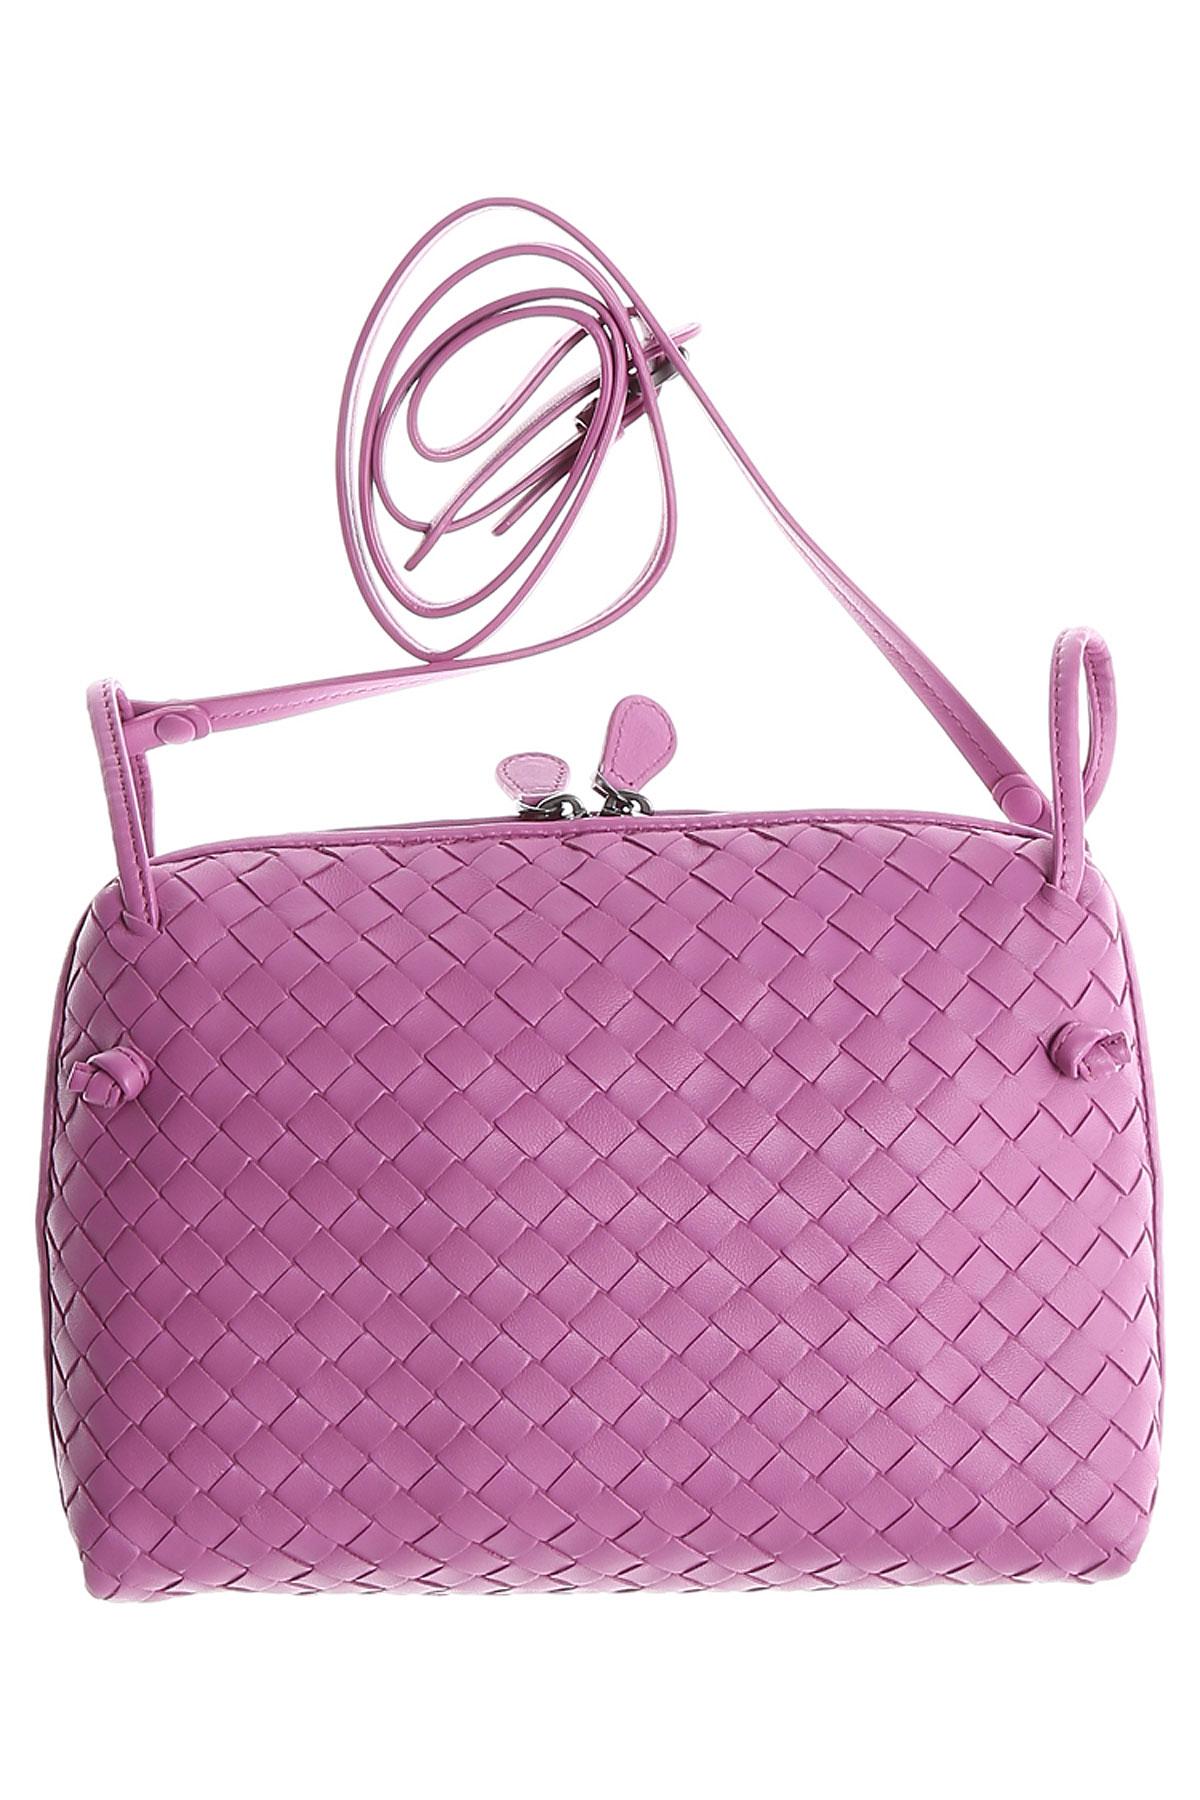 Bottega Veneta Shoulder Bag for Women, Peony, Leather, 2019